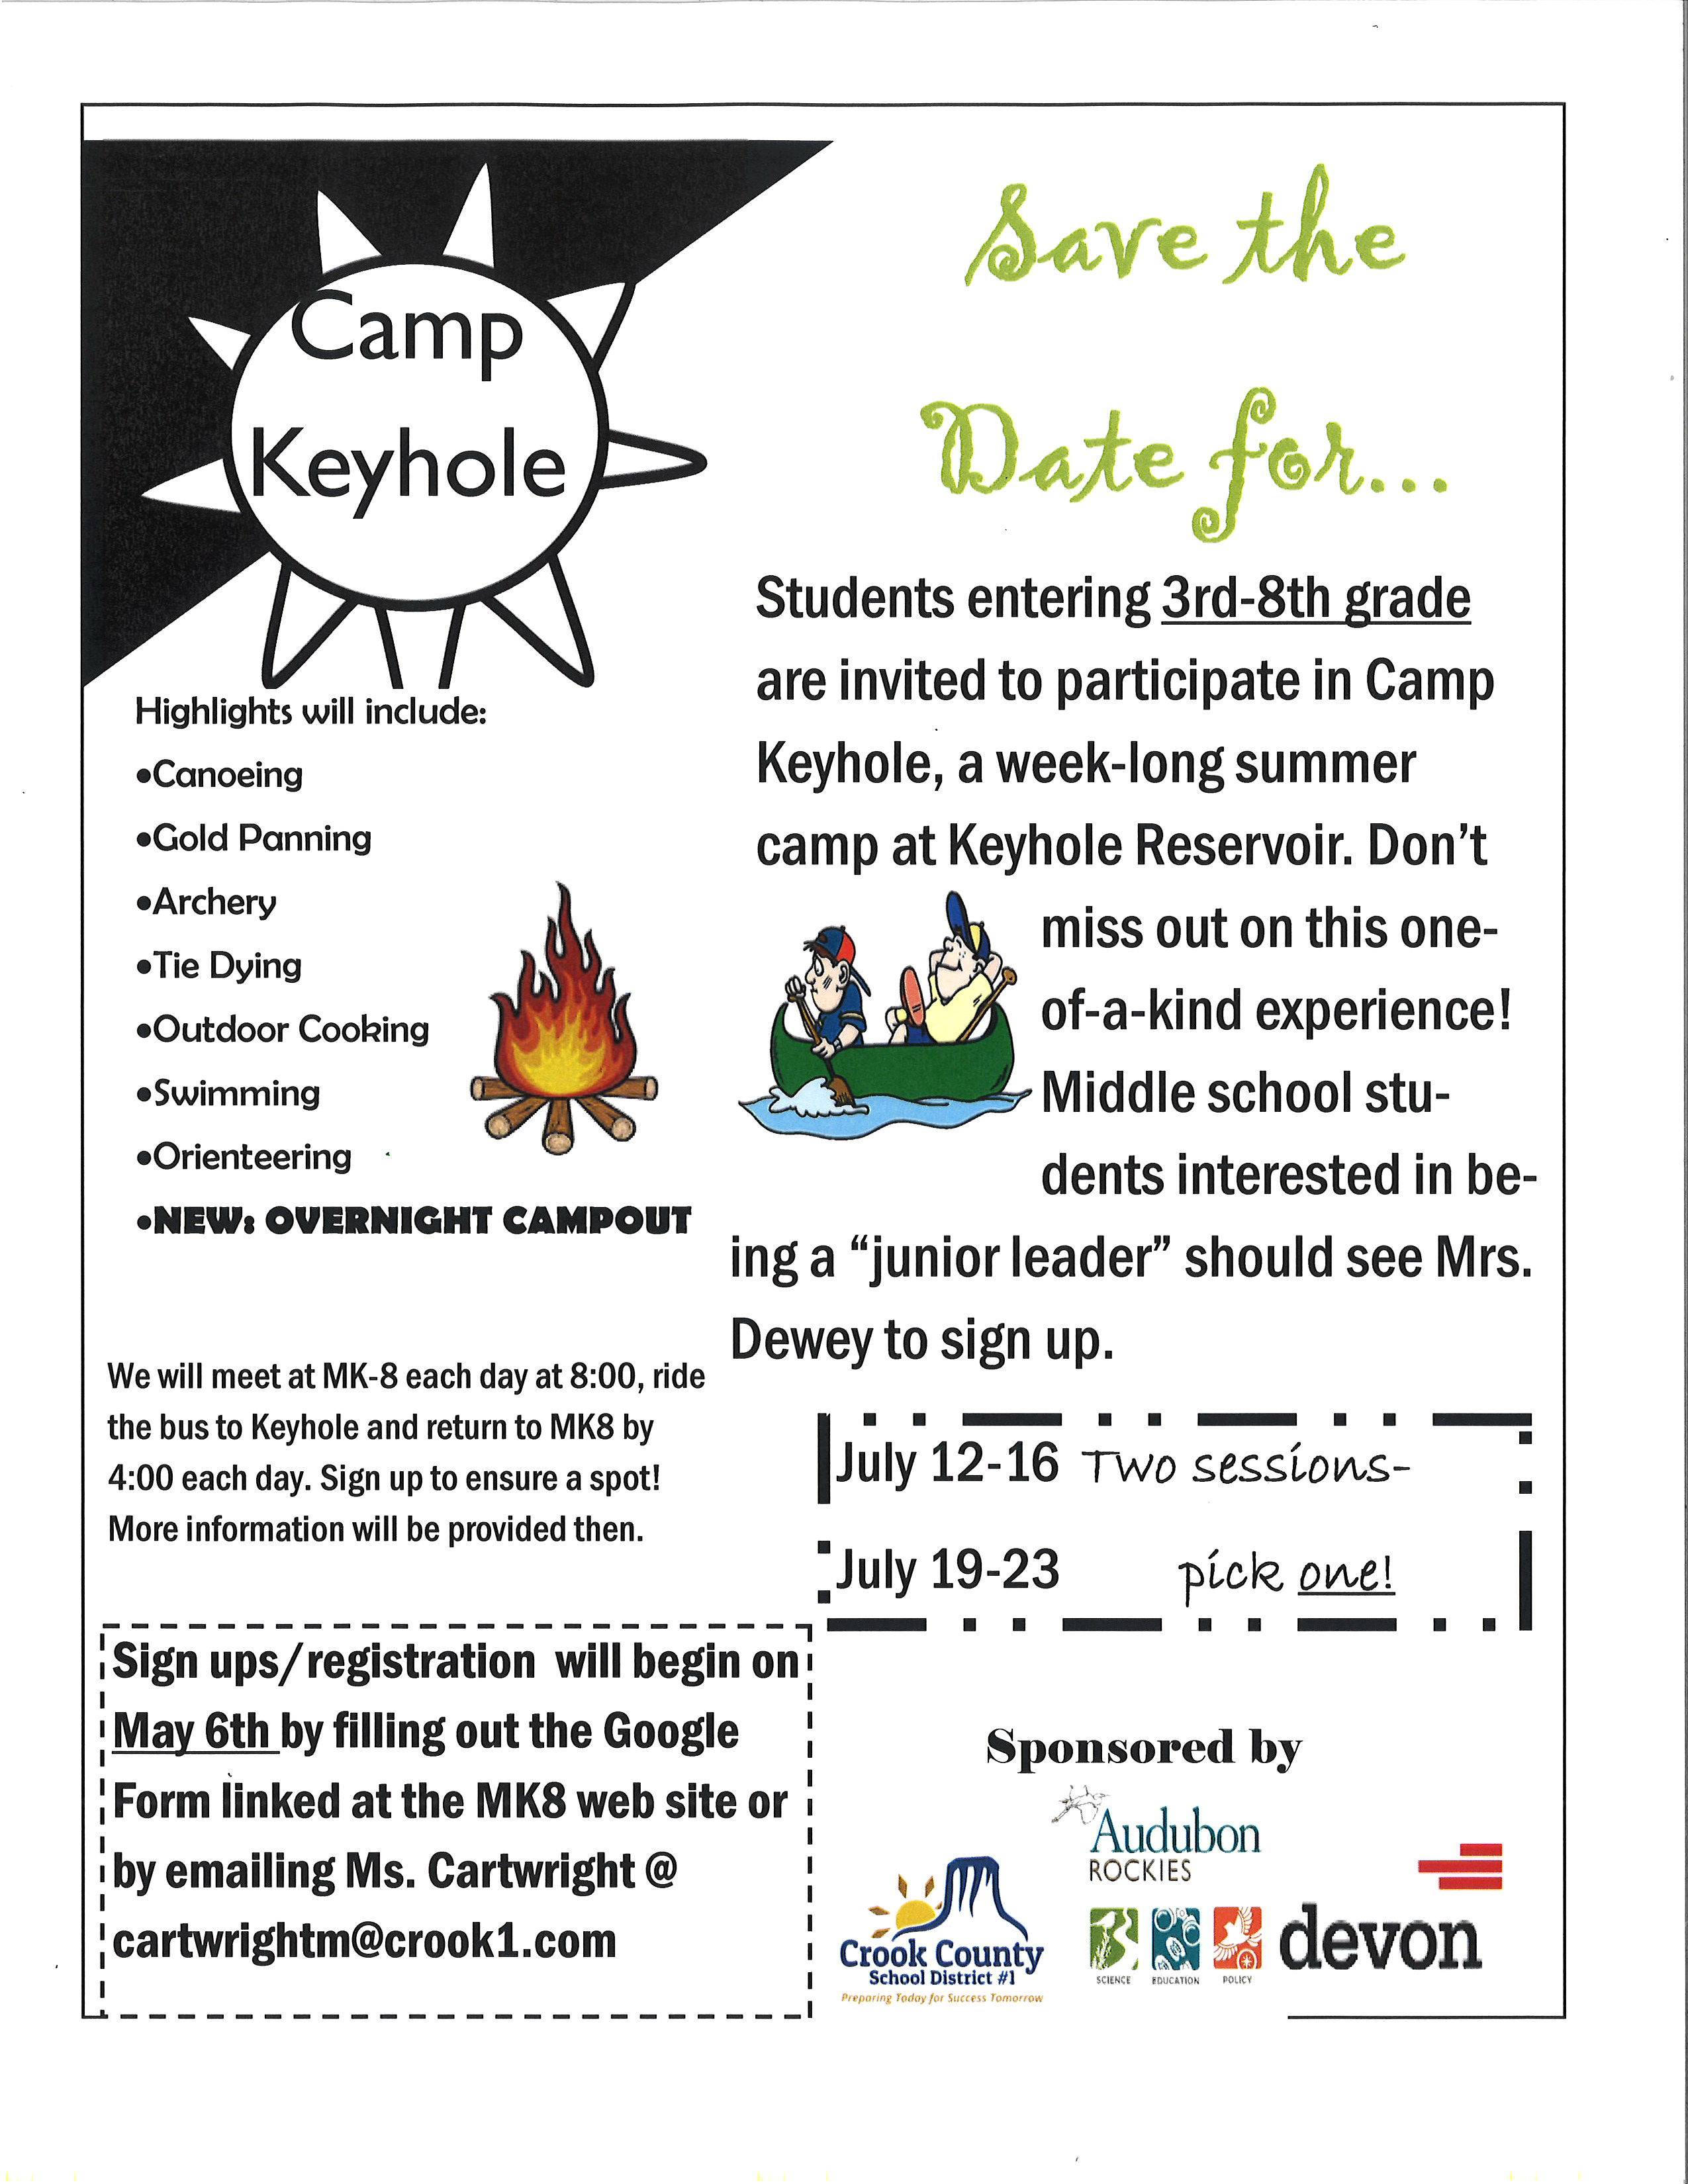 Camp Keyhole July 12-16 or July 19-23 open to Students entering into Grades 3-8https://docs.google.com/forms/d/e/1FAIpQLSeeT6VrRoxsHzCI_Lf-VS0r9Rjx8SU-MDP8TFGmfPcKLy1Ipw/viewform